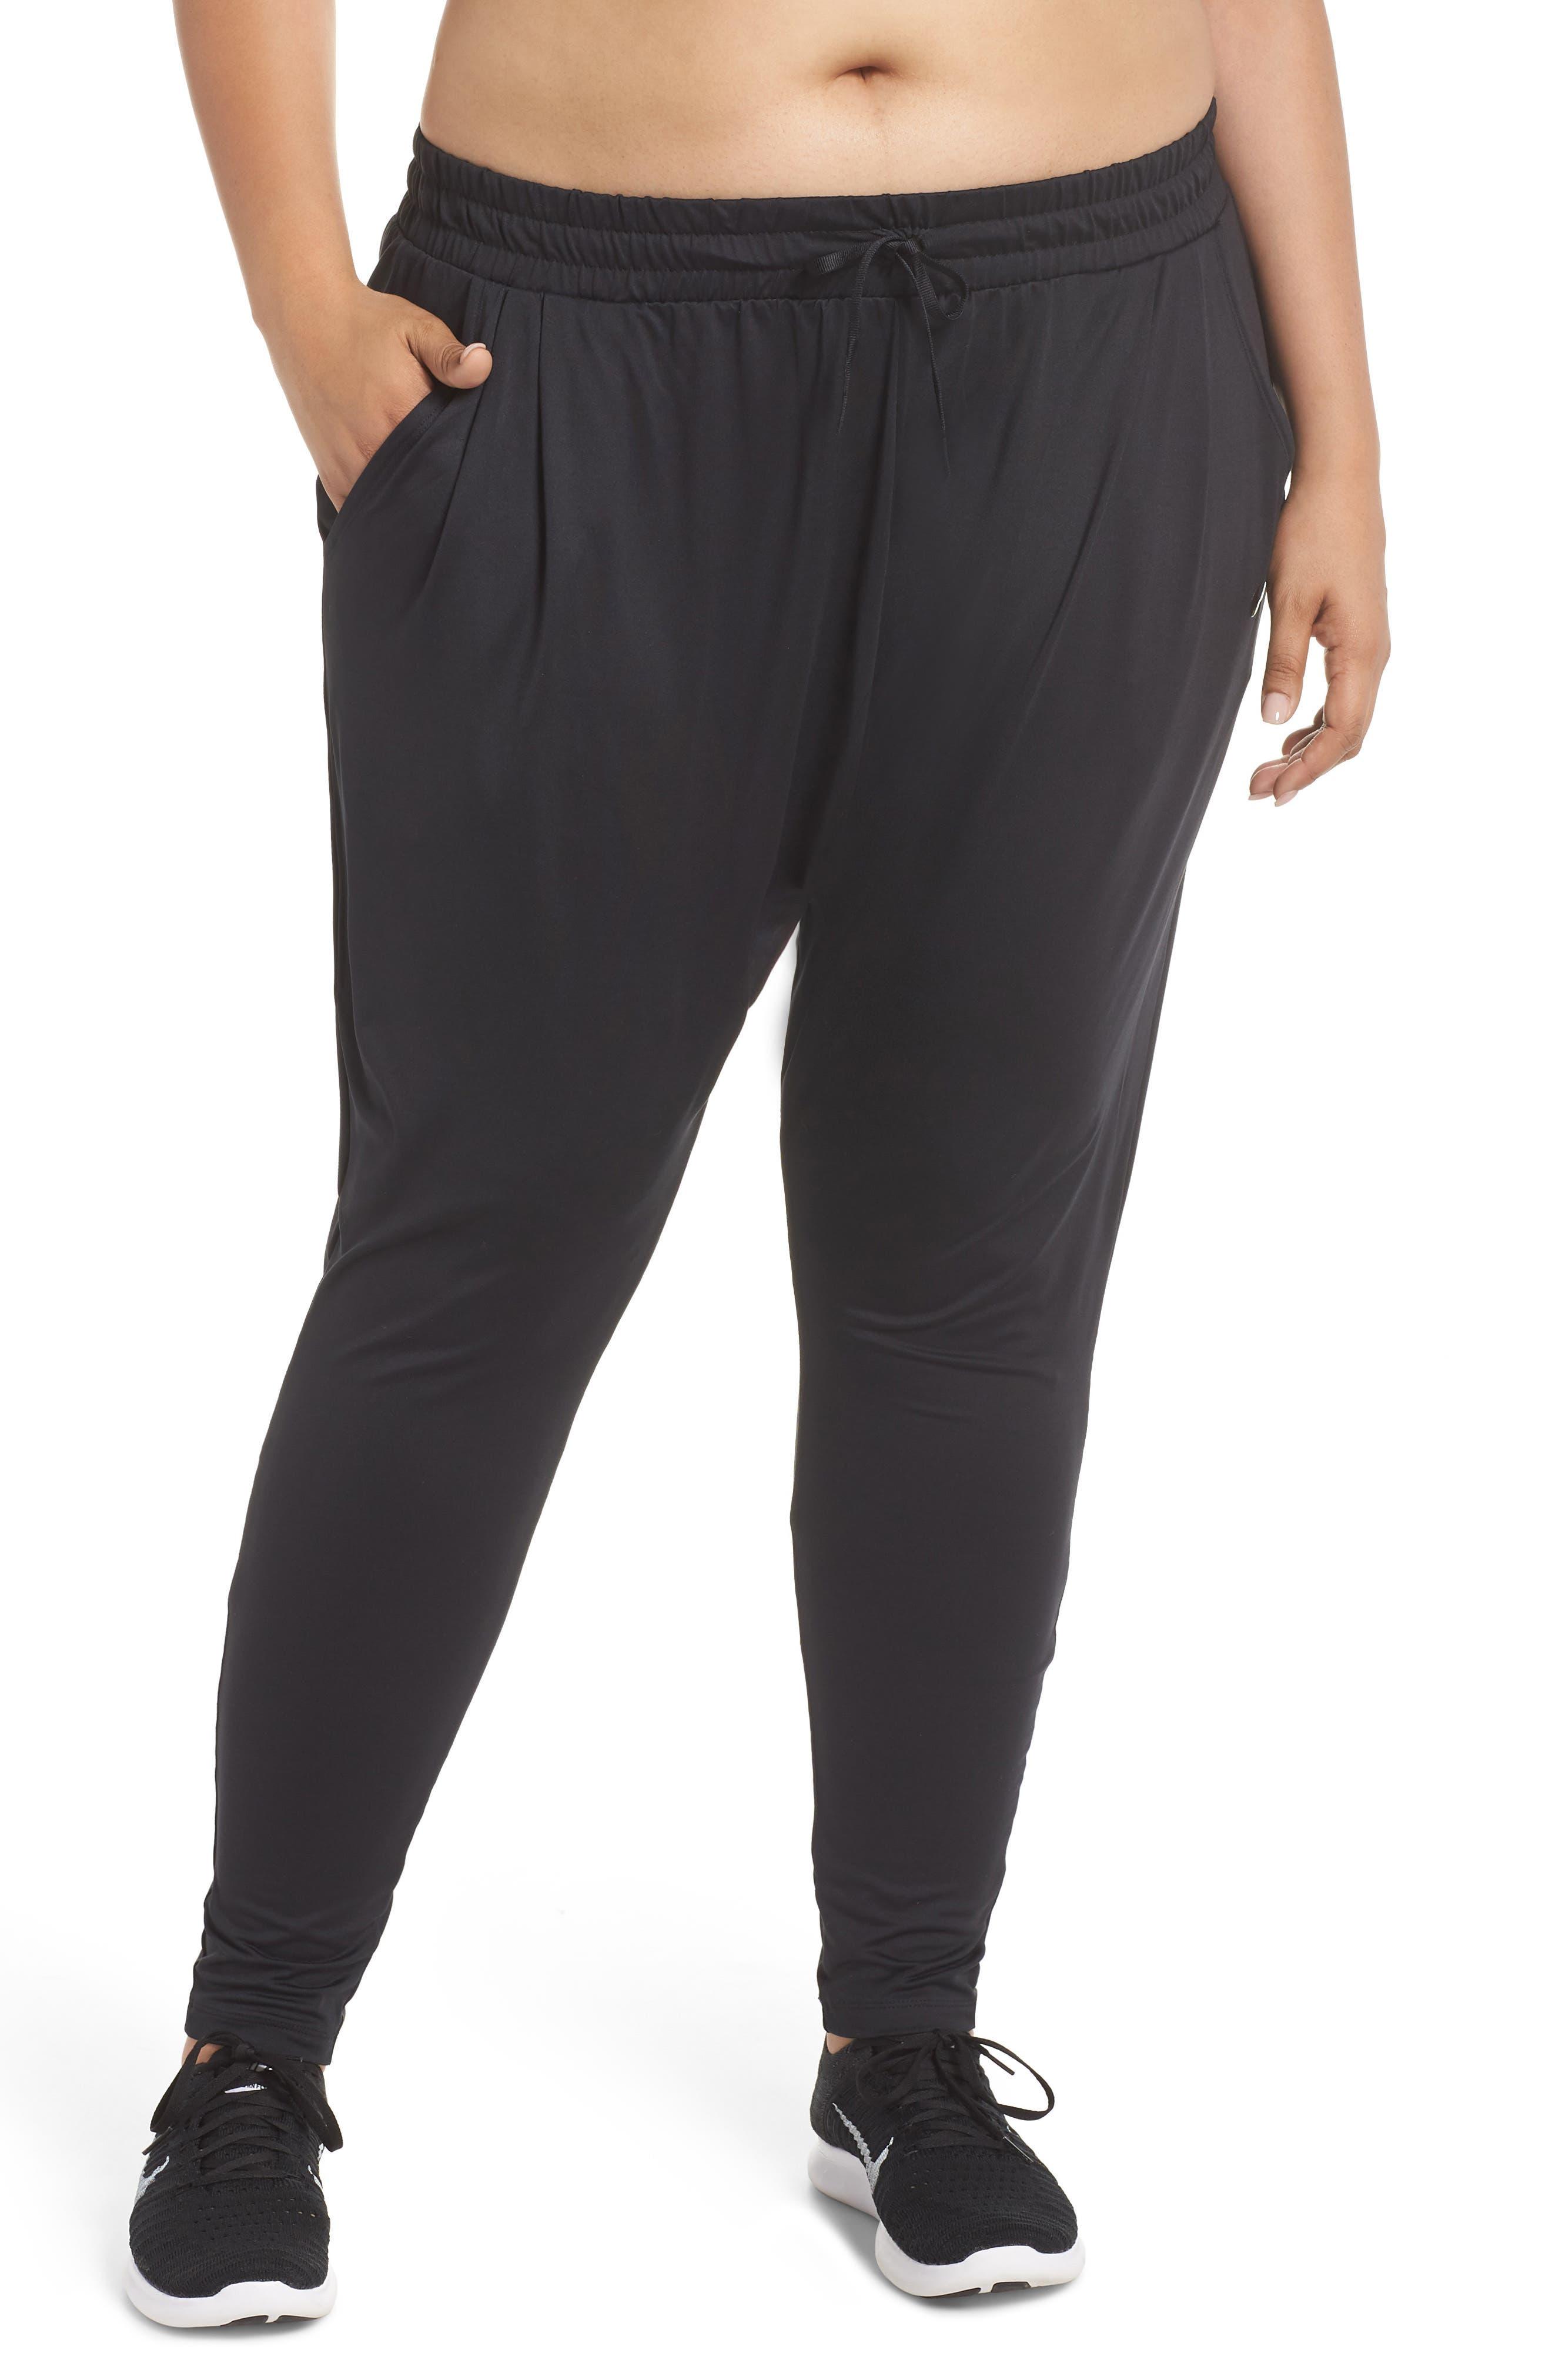 Dry Lux Flow Training Pants,                             Main thumbnail 1, color,                             Black/ Clear